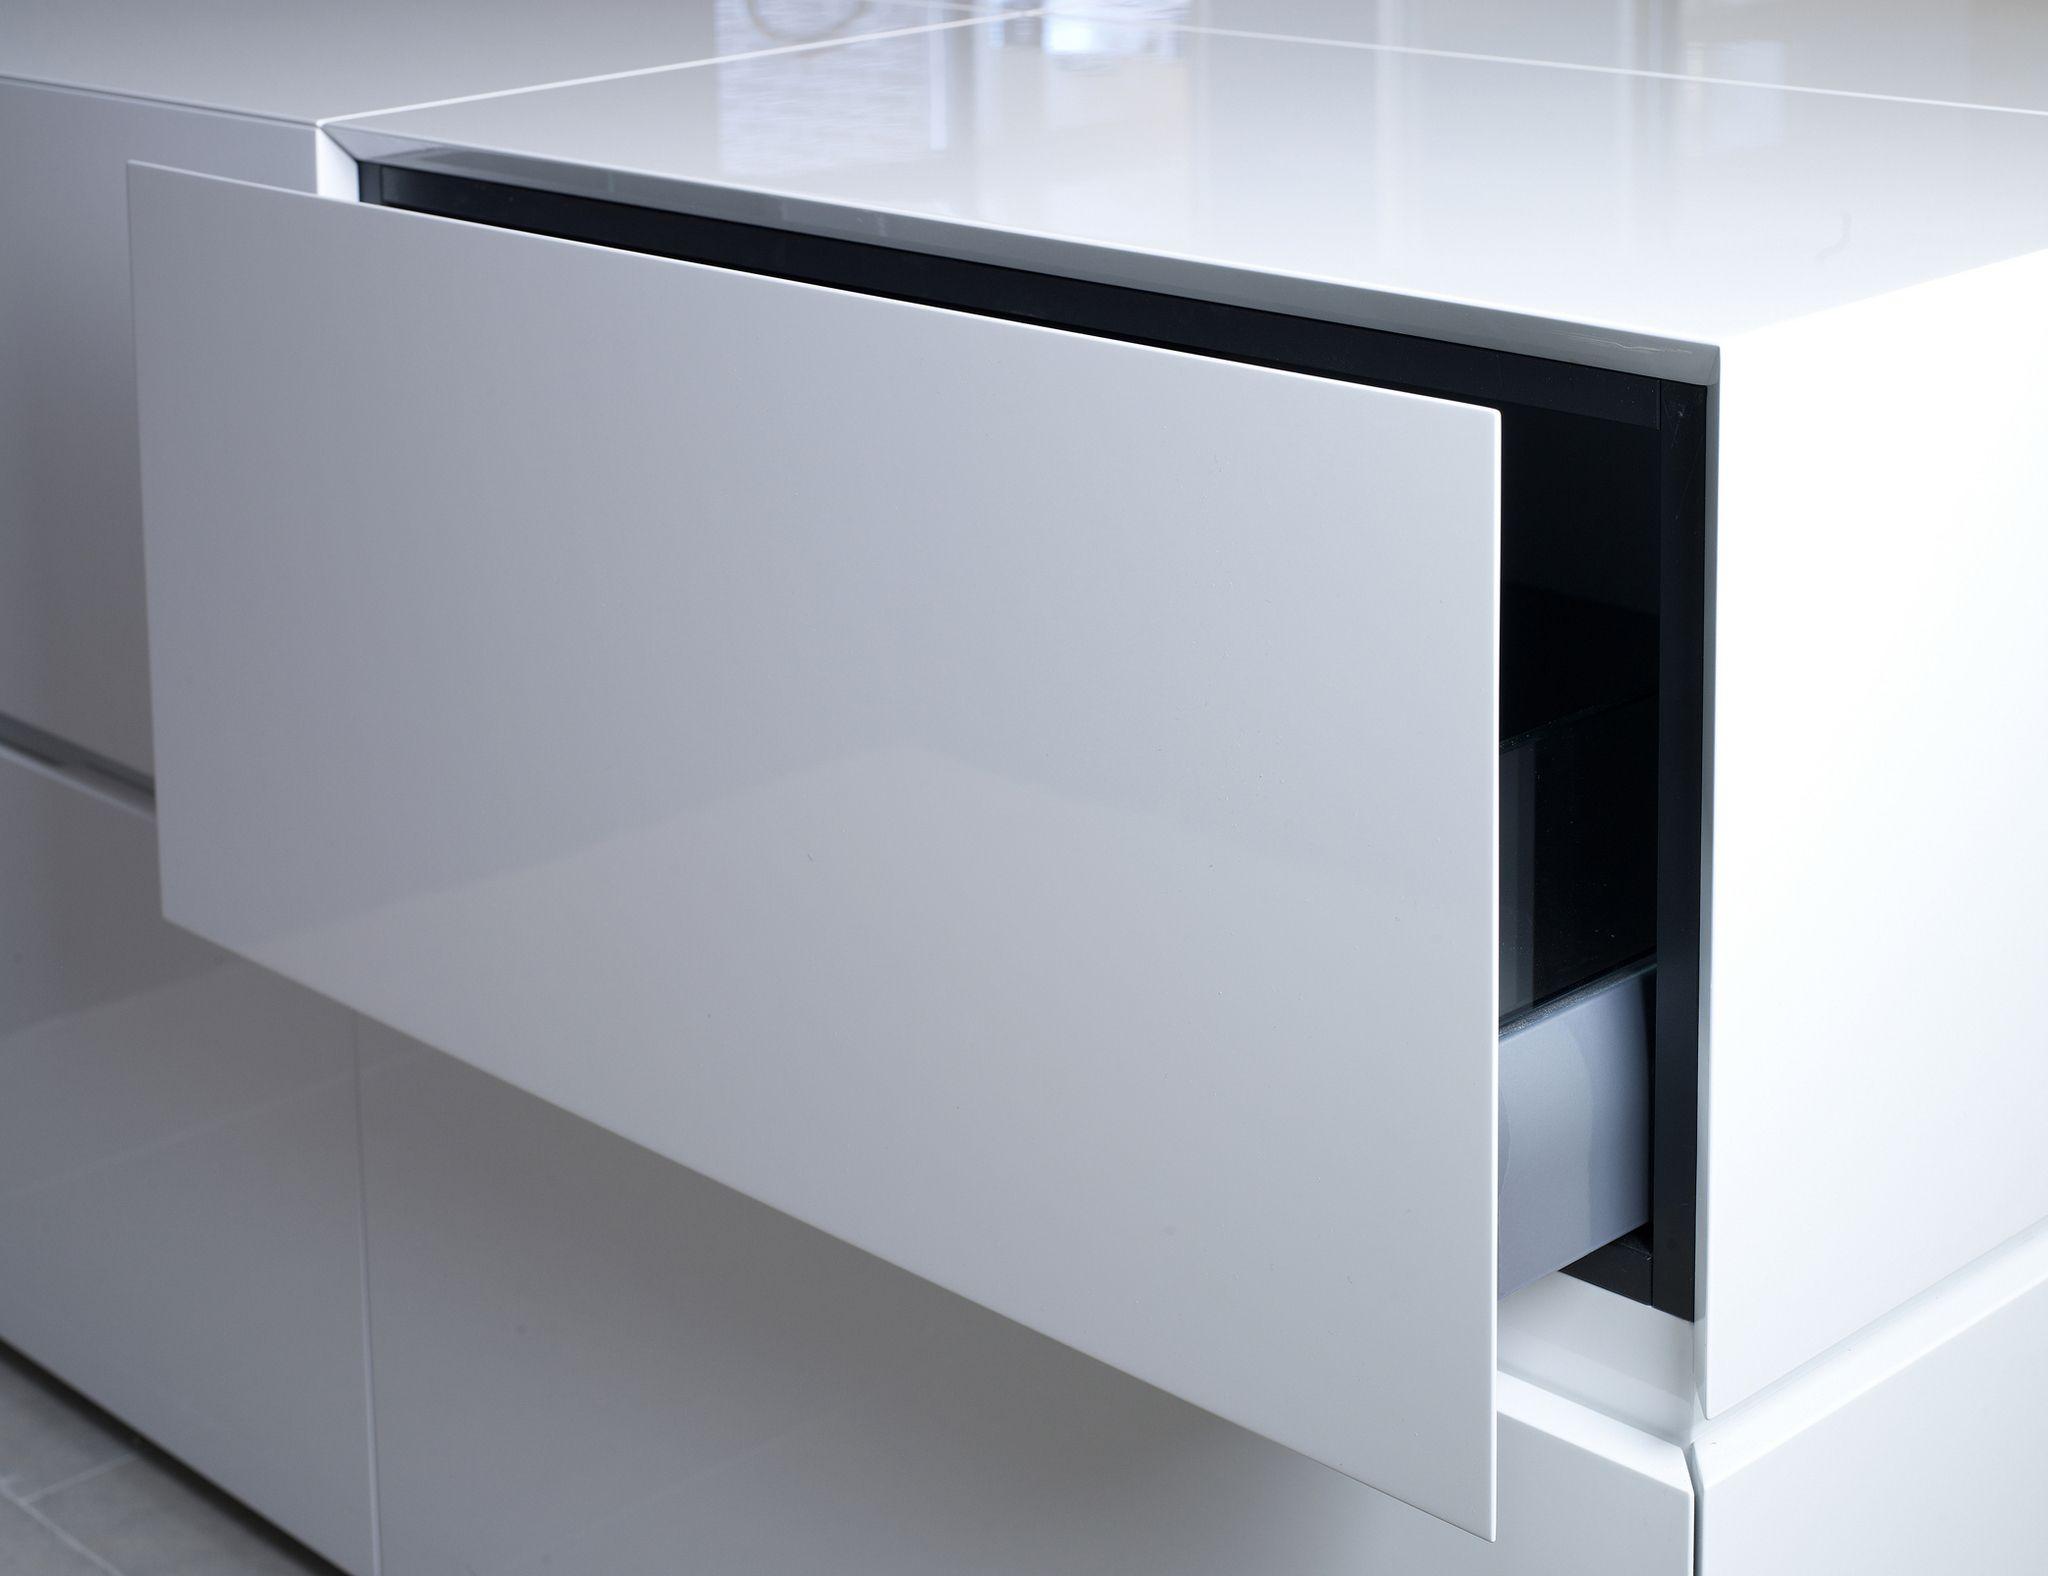 Design Cube Keuken : Culimaat high end kitchens interiors italiaanse keukens en